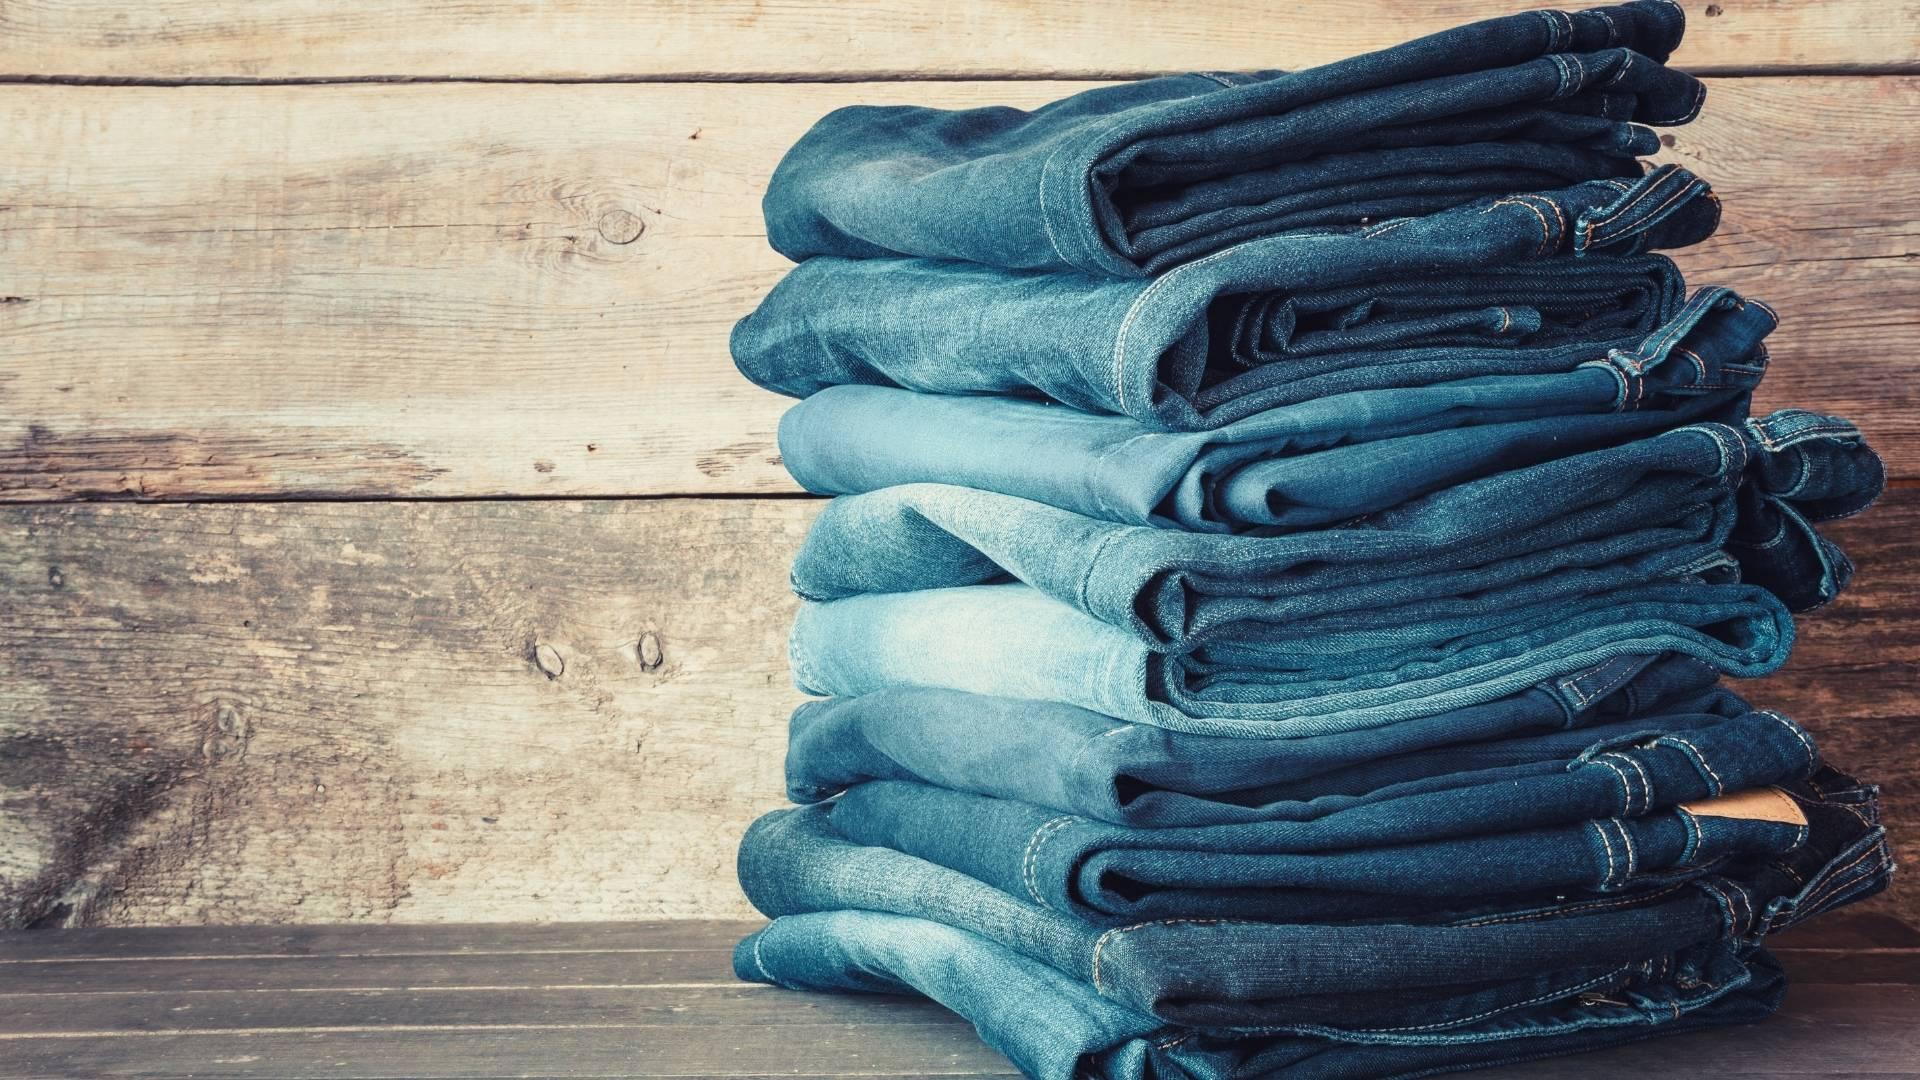 Marque jeans made in France, fabriqués en France